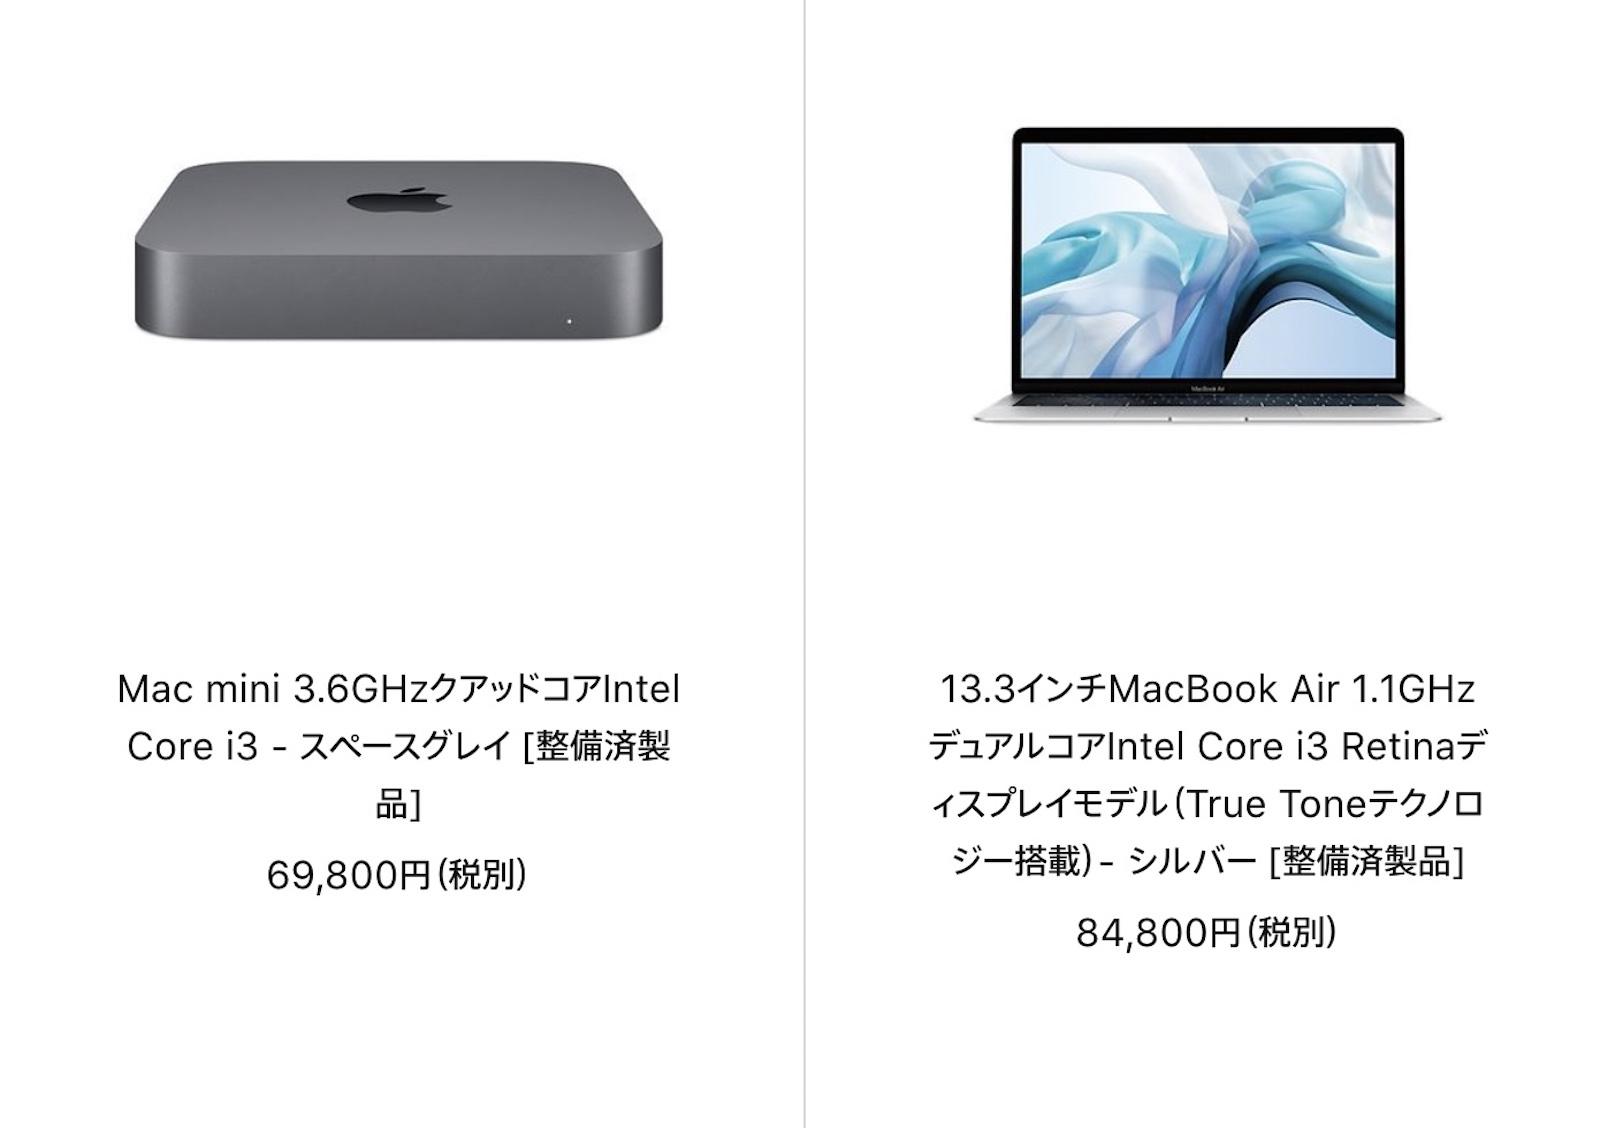 Mac mini really cheap